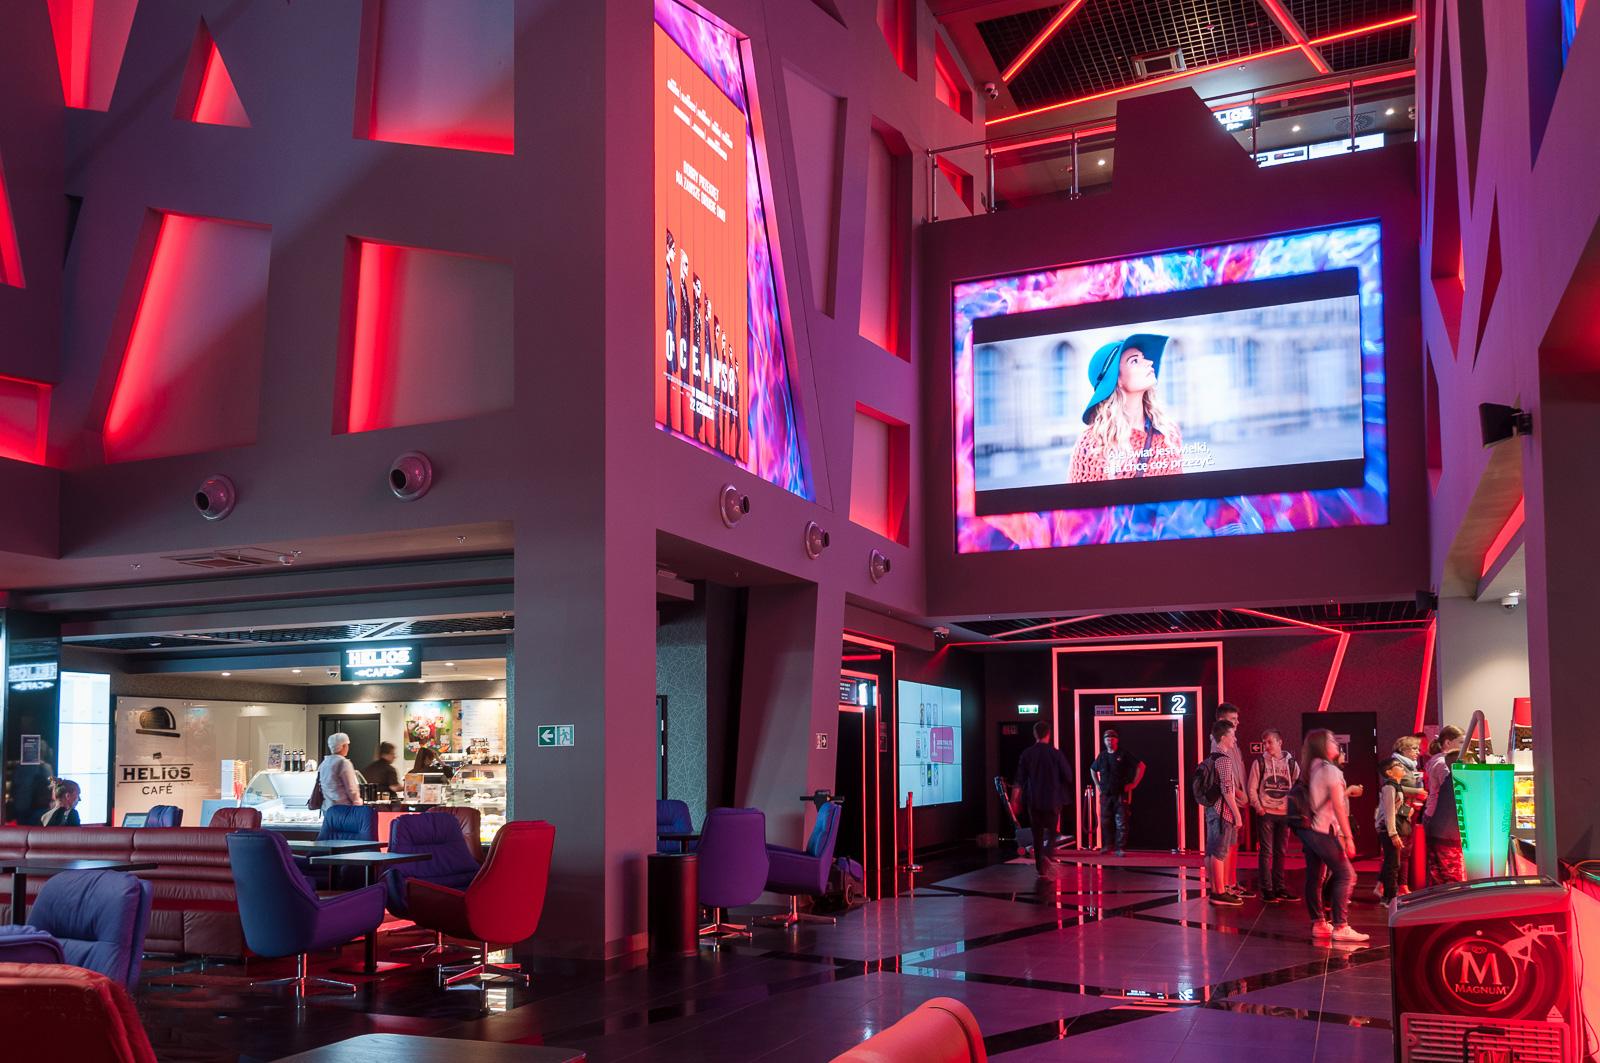 Helios-Forum-Gdansk-Poland-Lobby-Cafe-and-Concession-Stand-Adam-Dereskiewicz.jpg